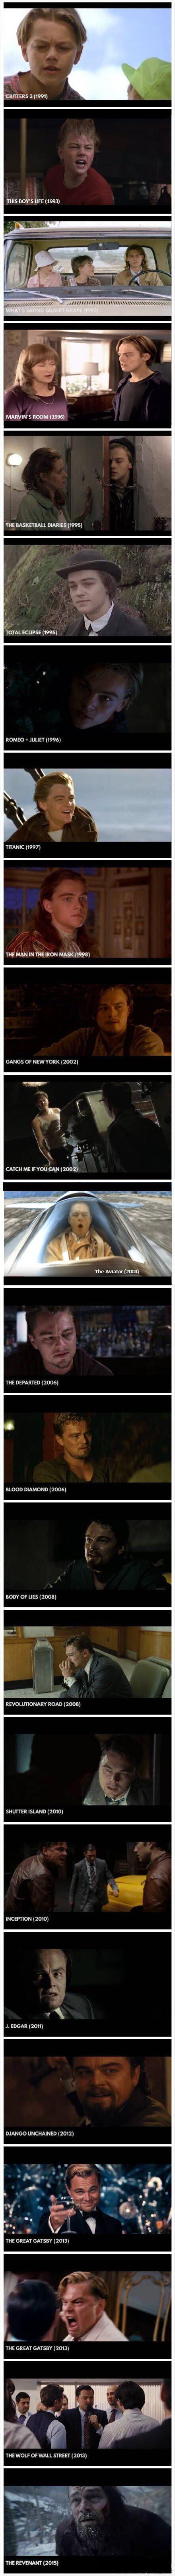 Leonardo DiCaprio Oscar Winning Movies Round-up